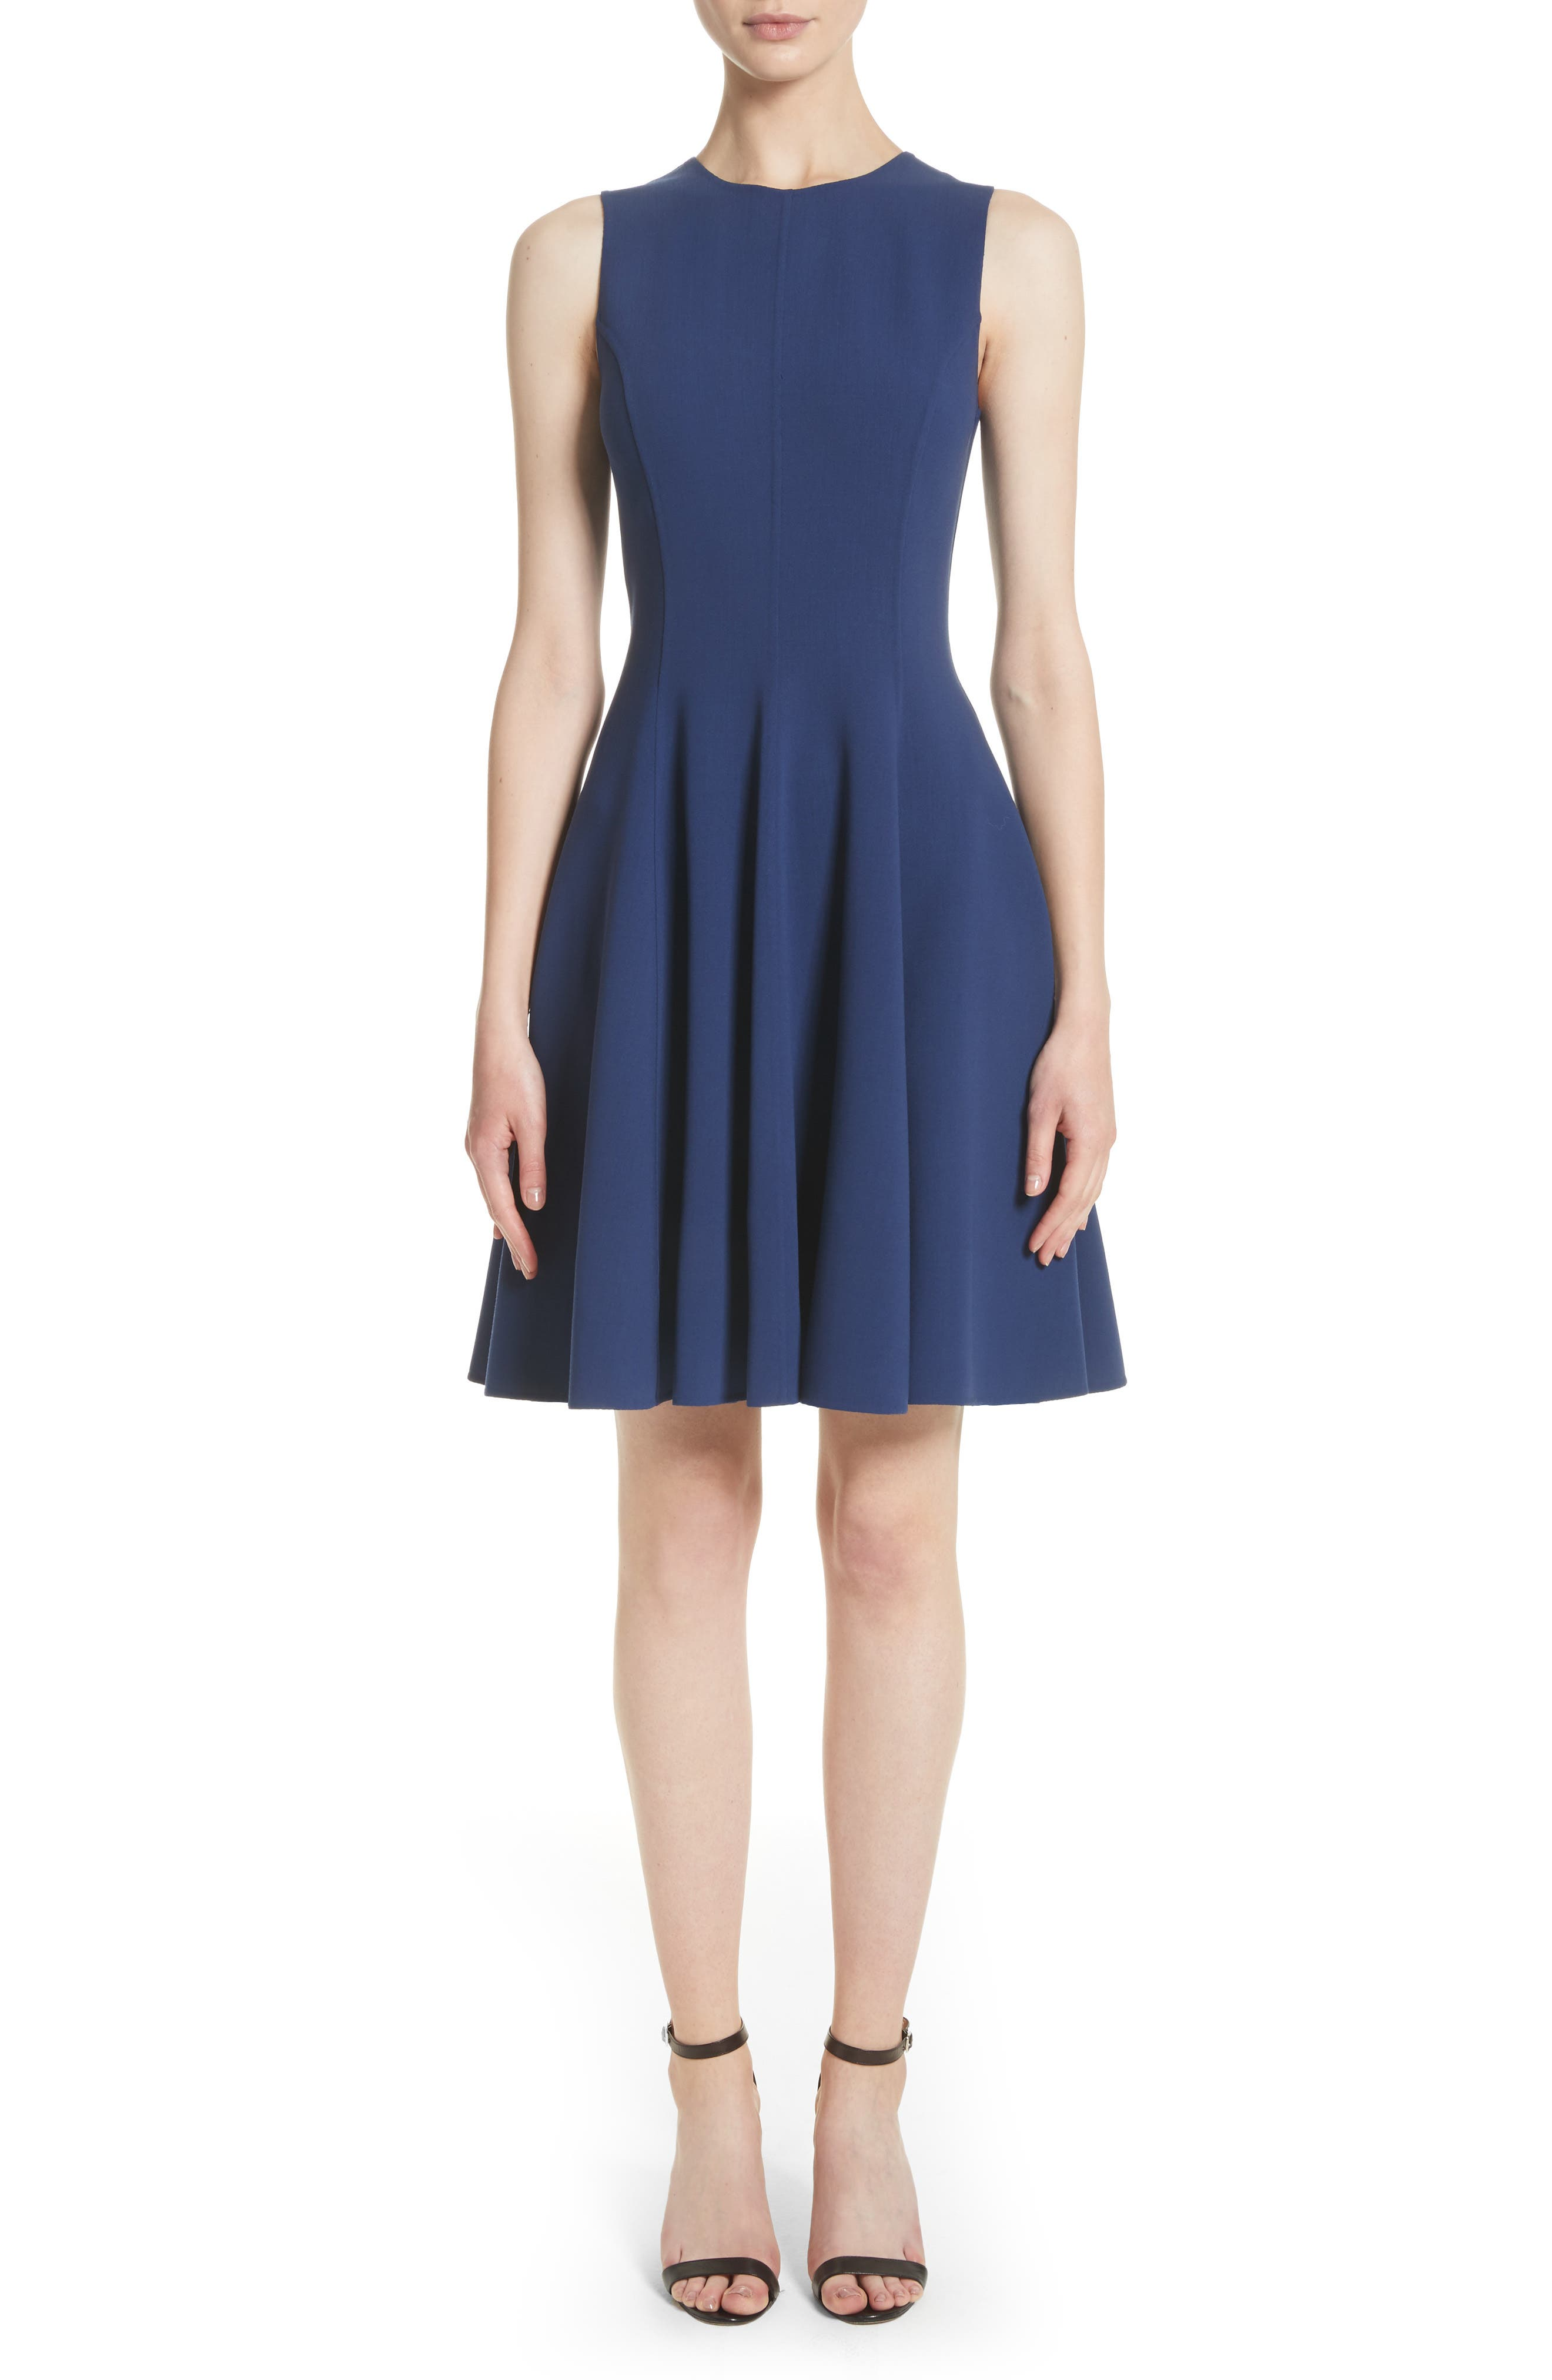 Main Image - Michael Kors Stretch Wool Bell Dress